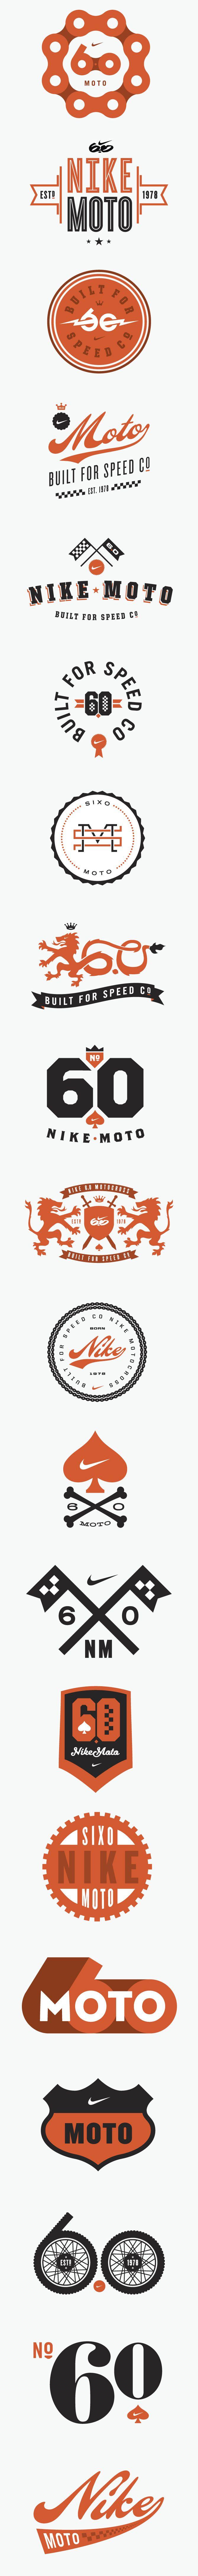 nike 6.0 motocross logos. 全部かっこいい。